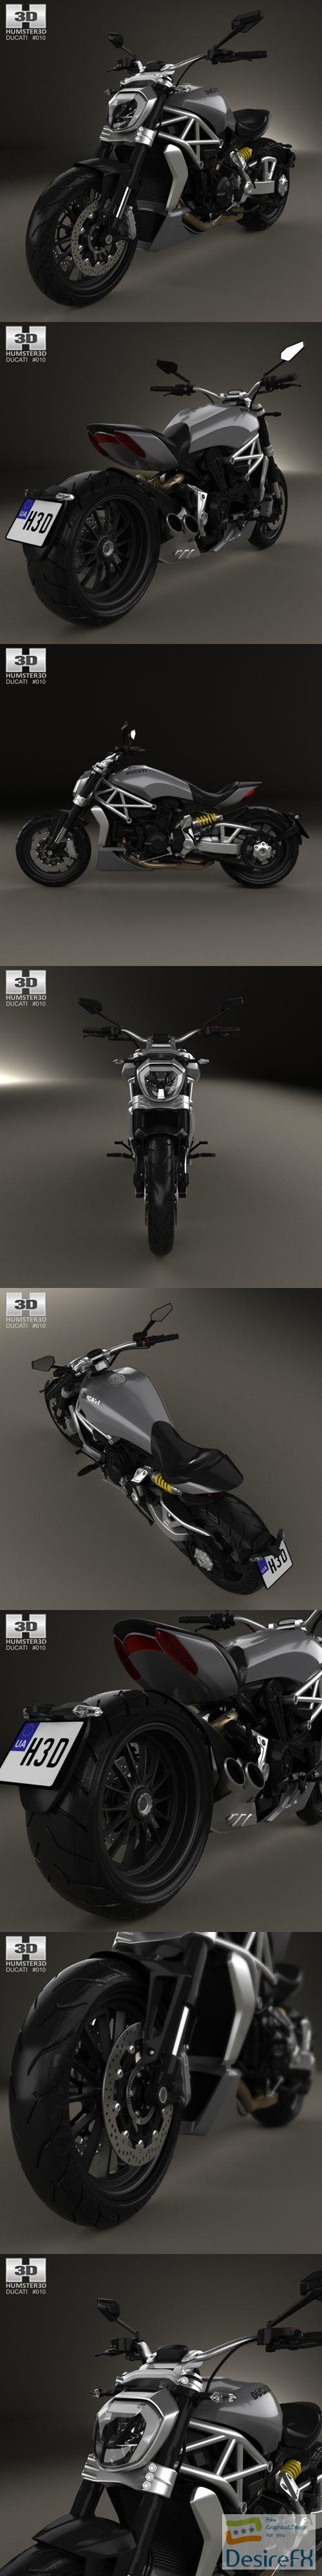 3d-models - Hum3D - Ducati X-Diavel 2016 3D Model